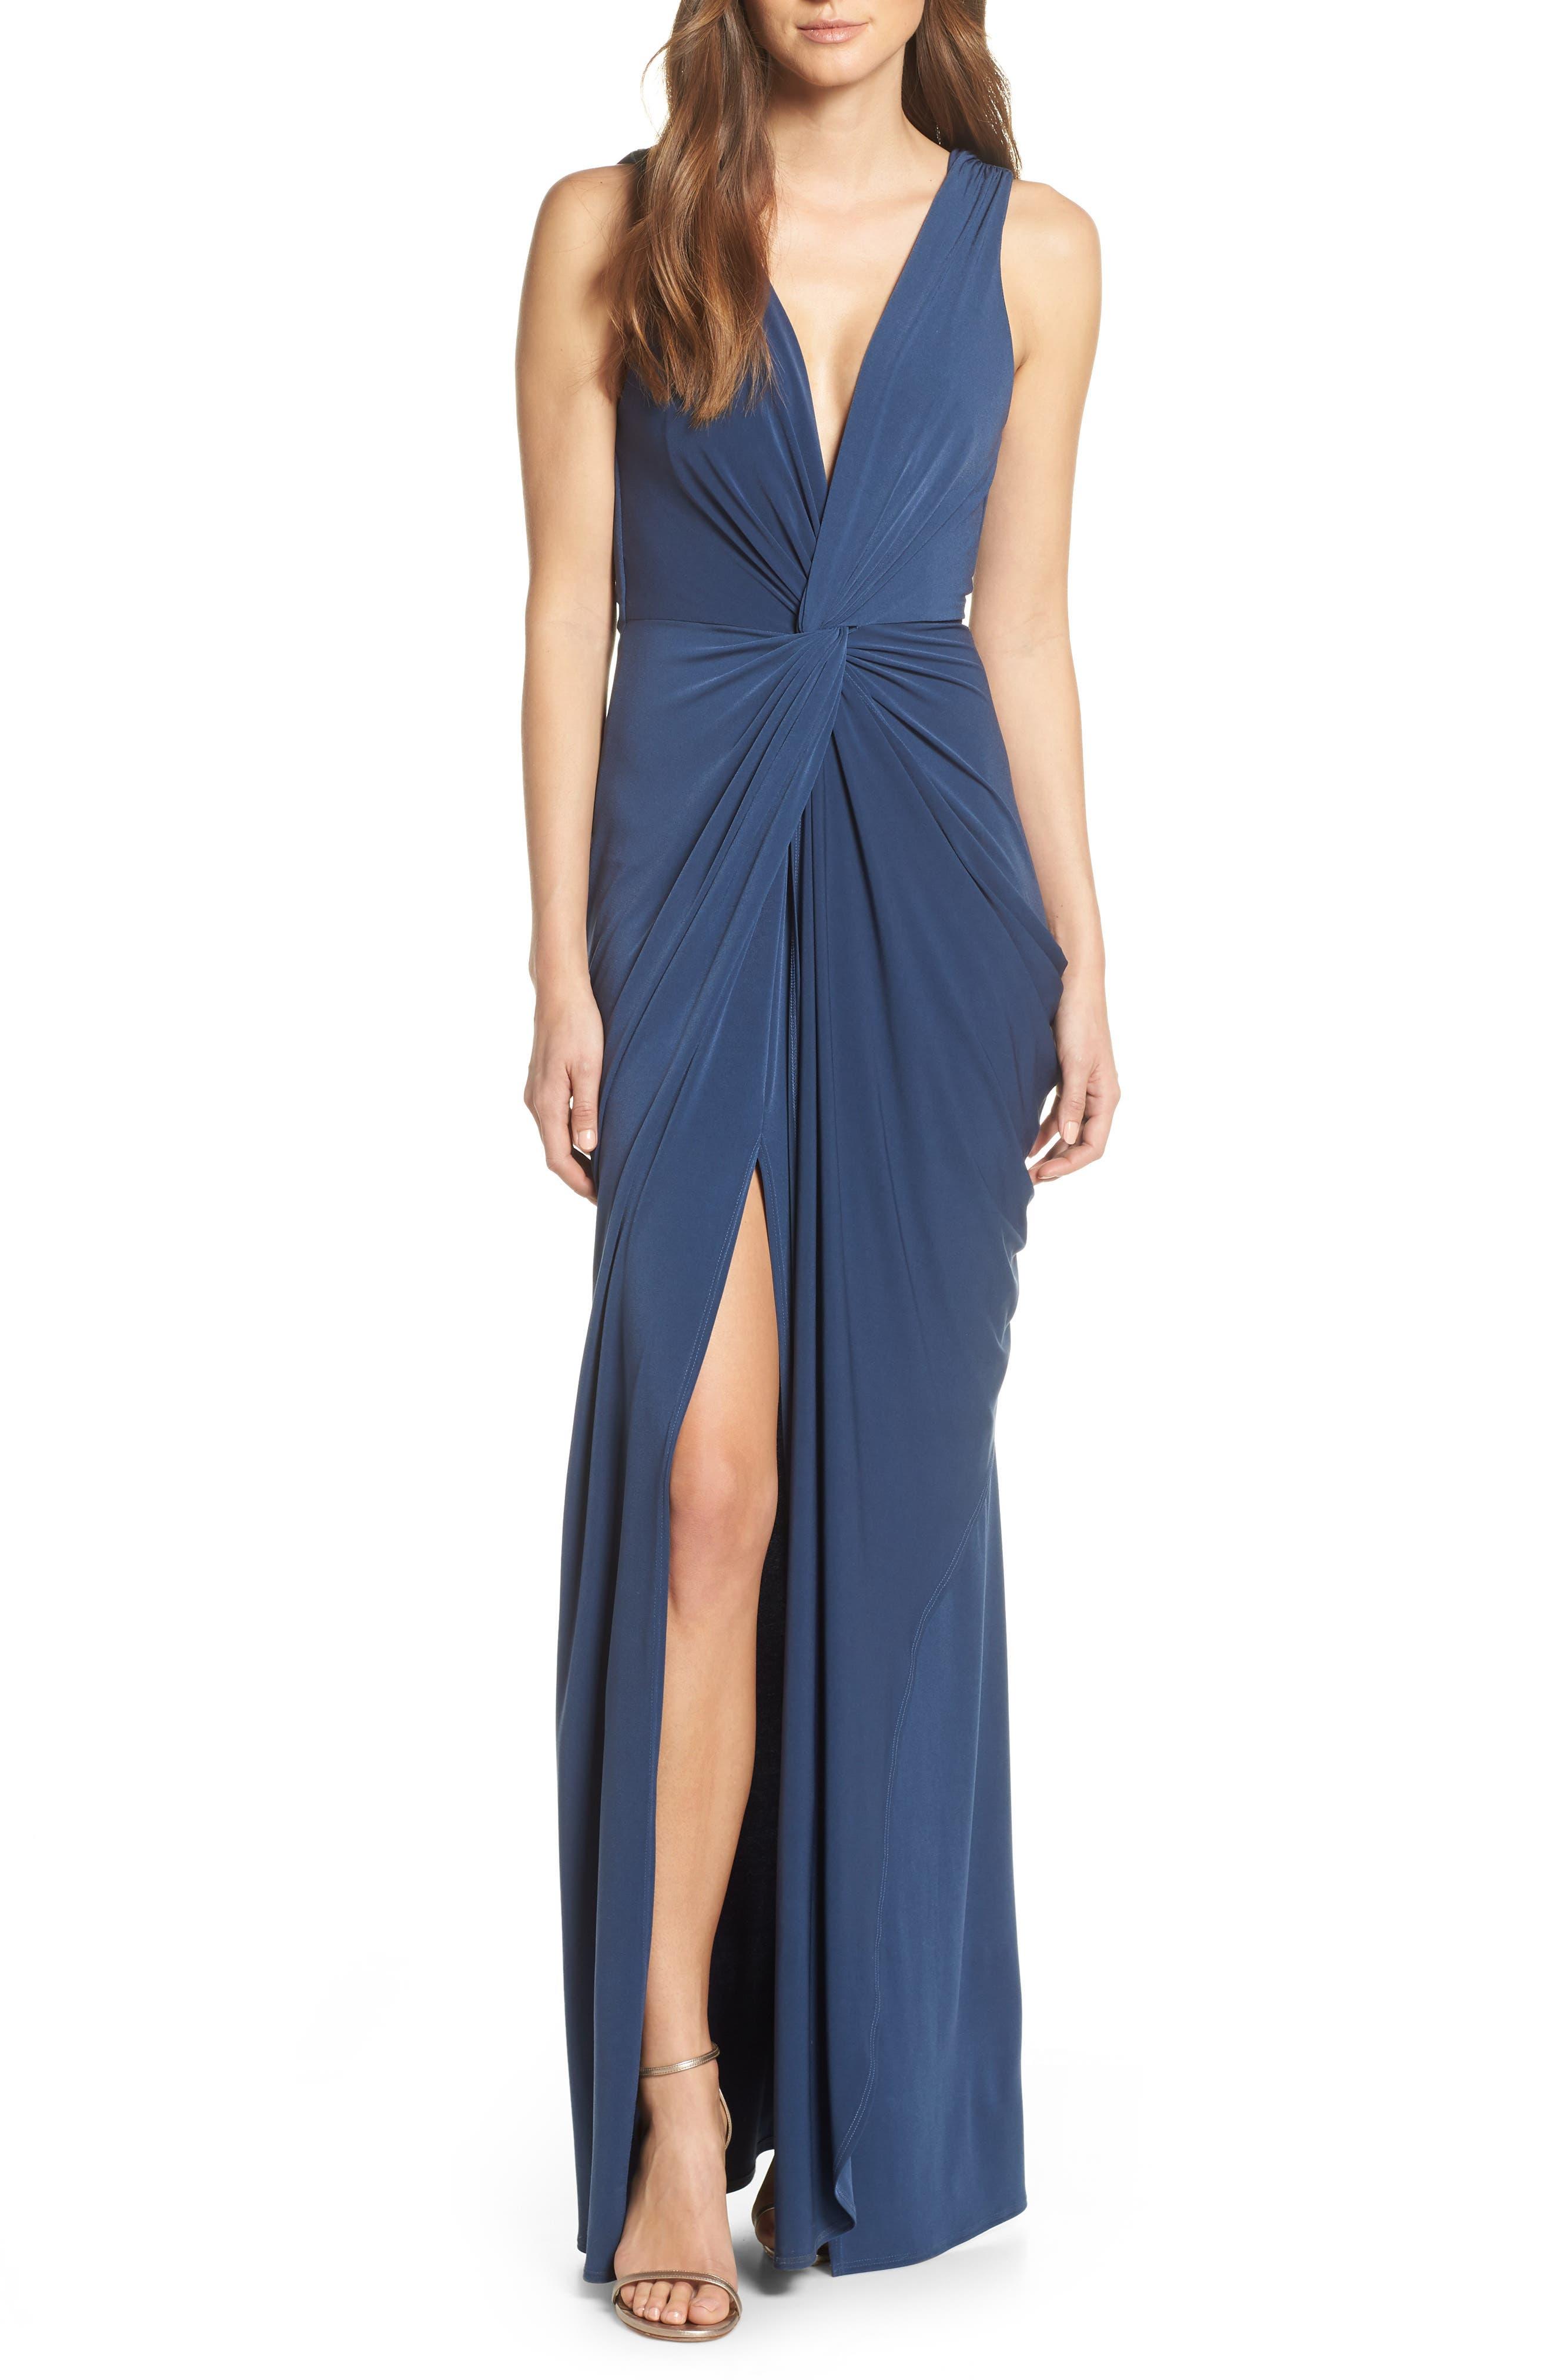 KATIE MAY, Leo Twist Front Evening Dress, Main thumbnail 1, color, DEEP SEA